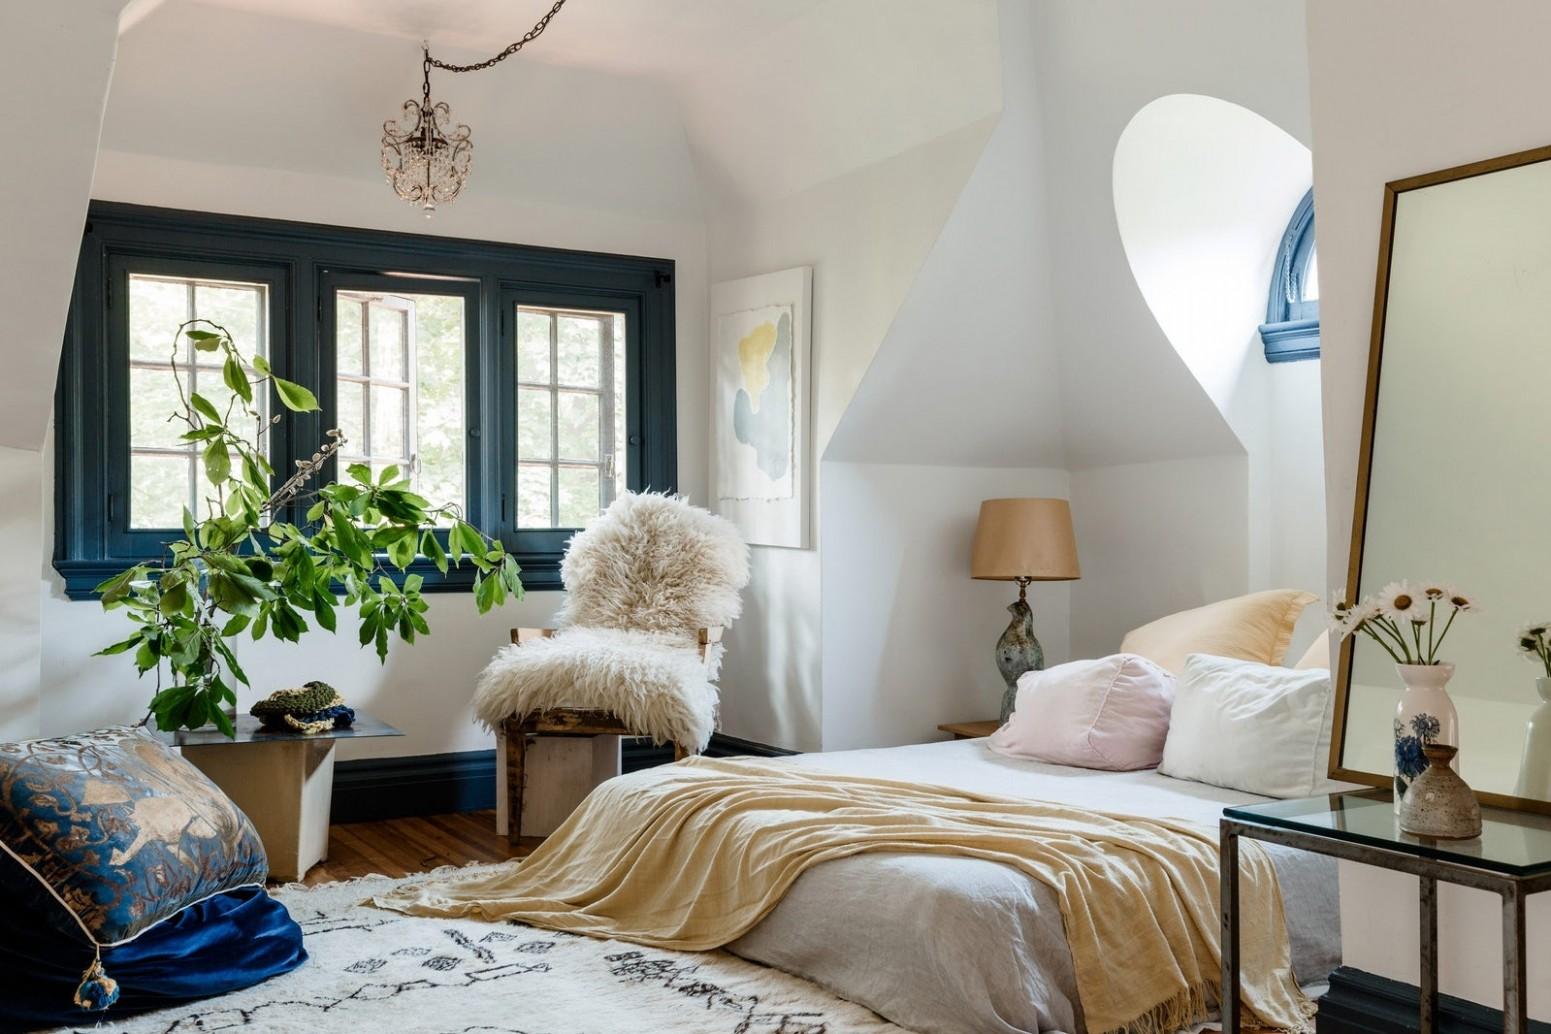 11 Cozy Bedroom Ideas  Architectural Digest - Bedroom Ideas Design